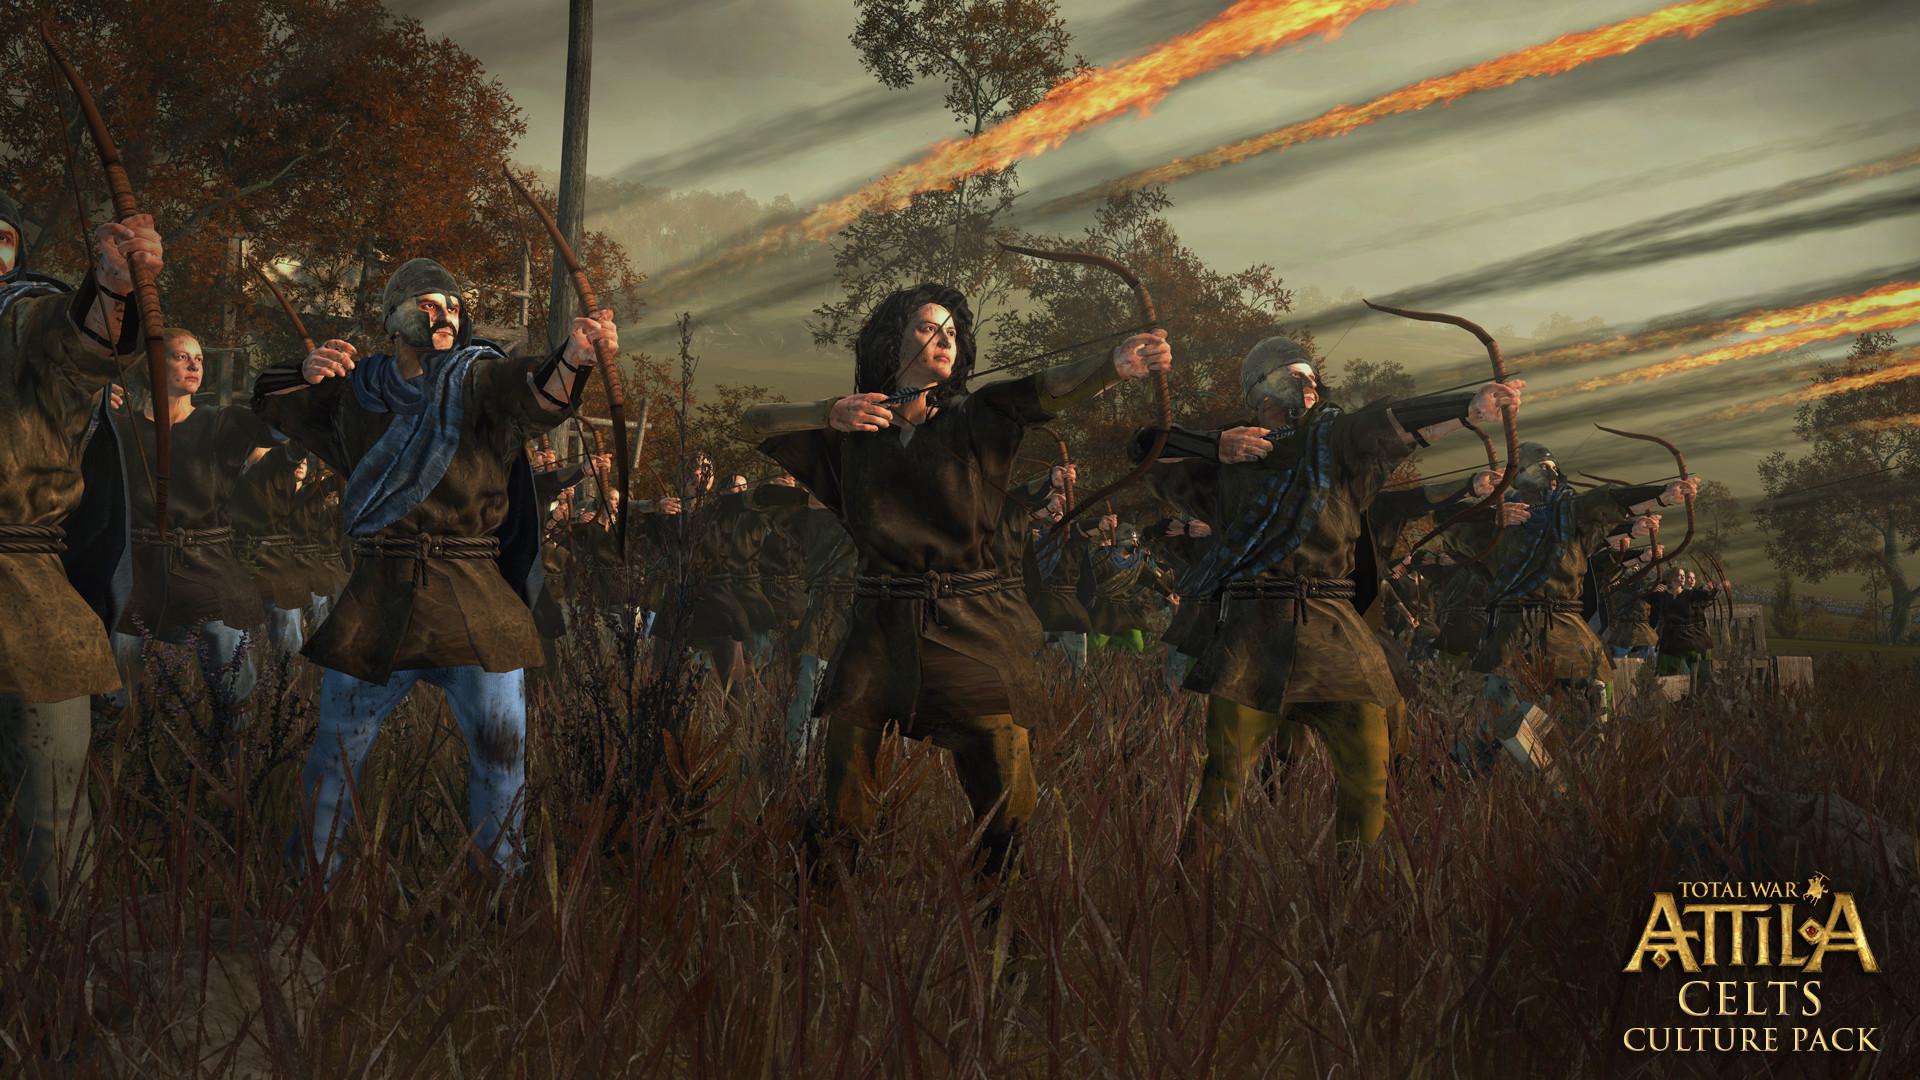 Total War: ATTILA - Celts Culture Pack Fiyat Karşılaştırma